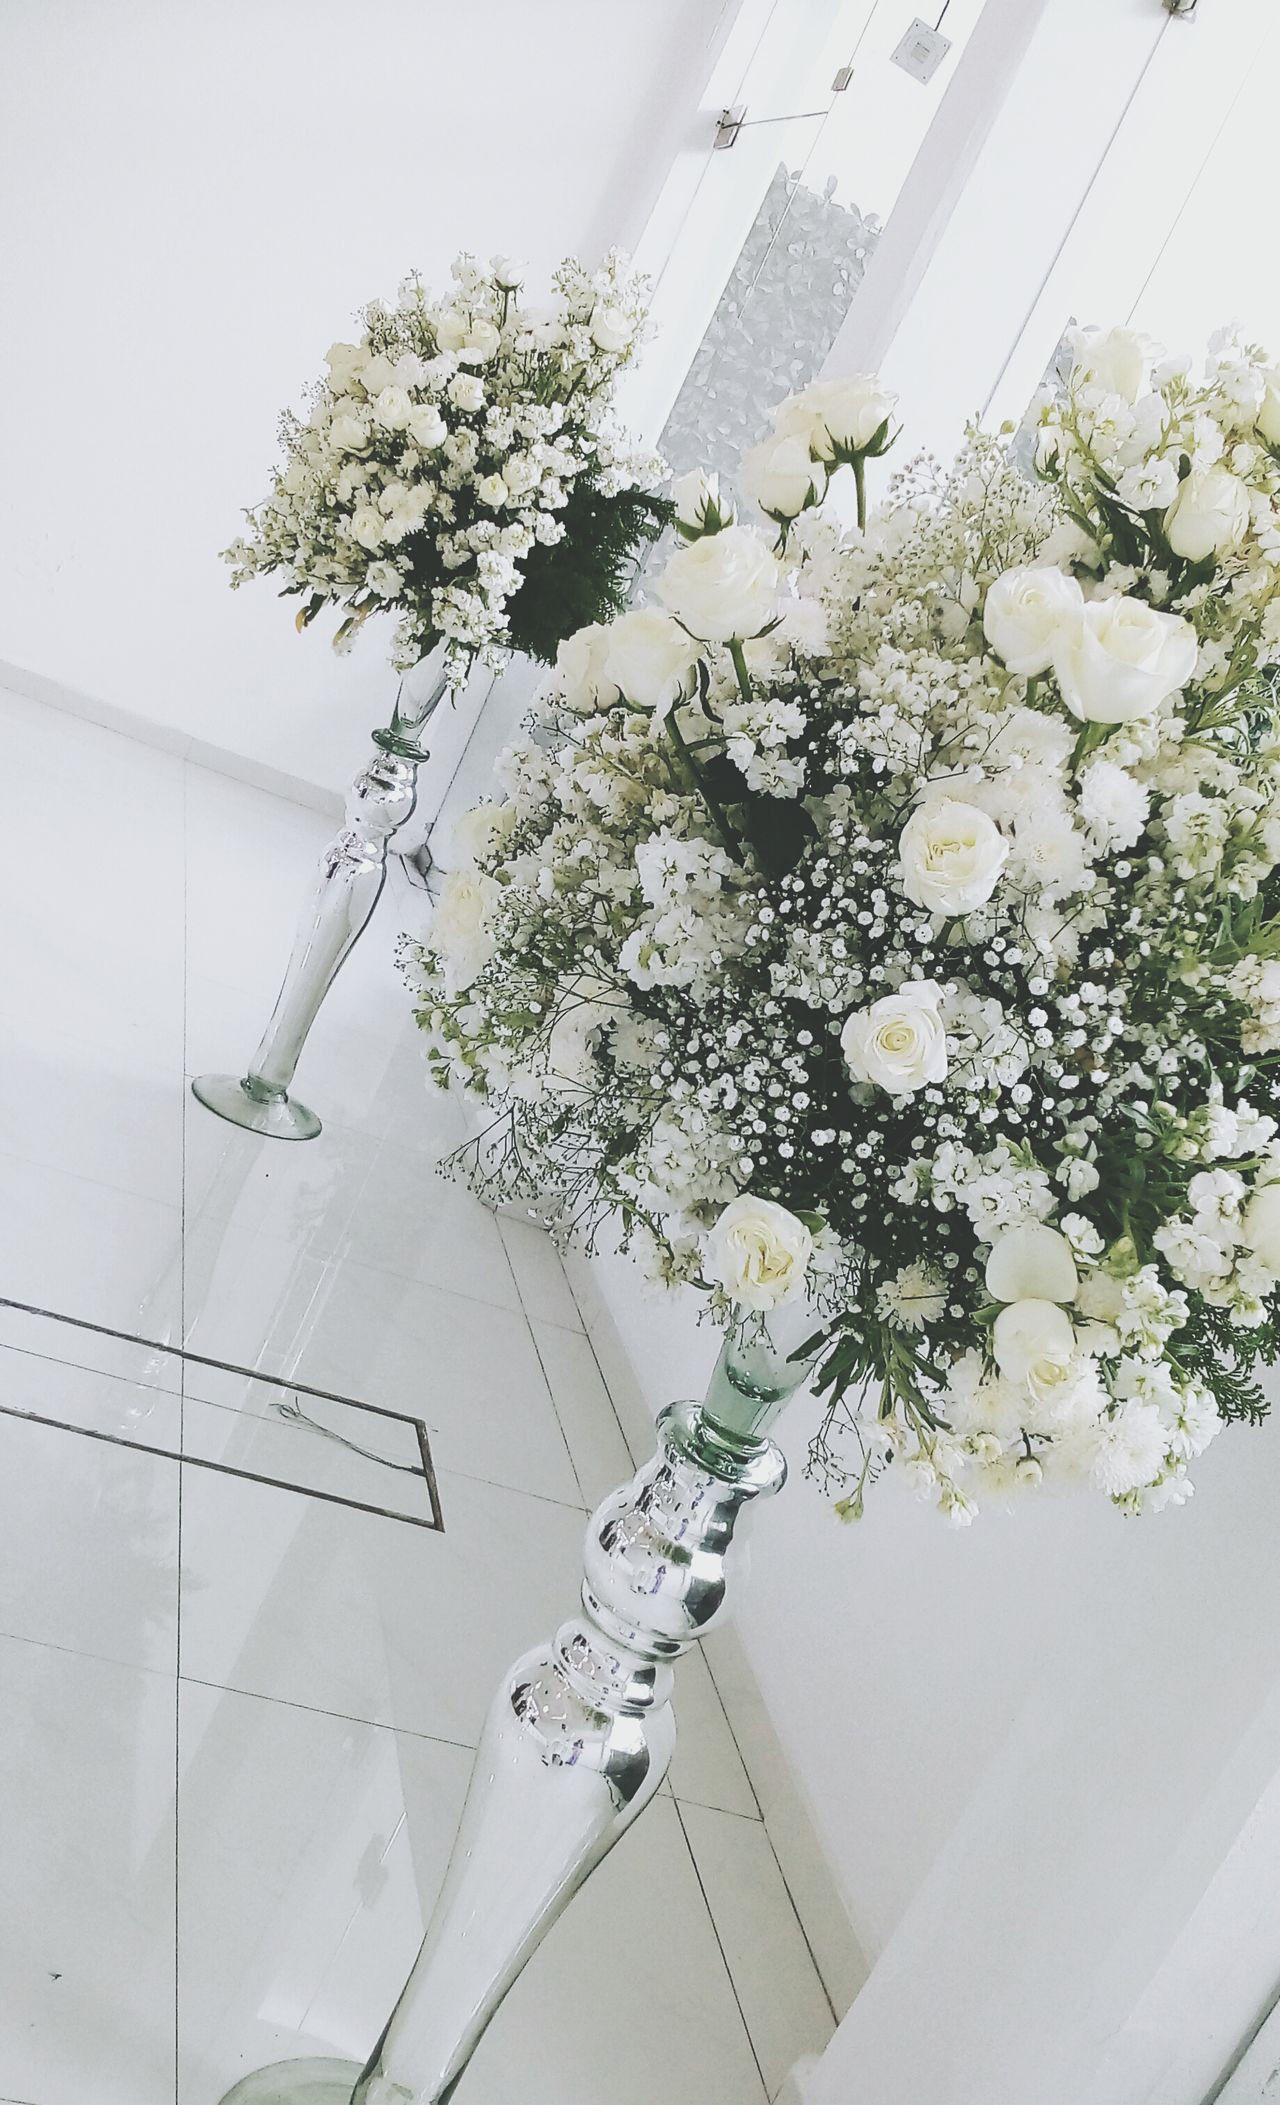 Elegance is key. Elégance Flower No People Plant Nature Indoors  Close-up Wedding Floral White Love